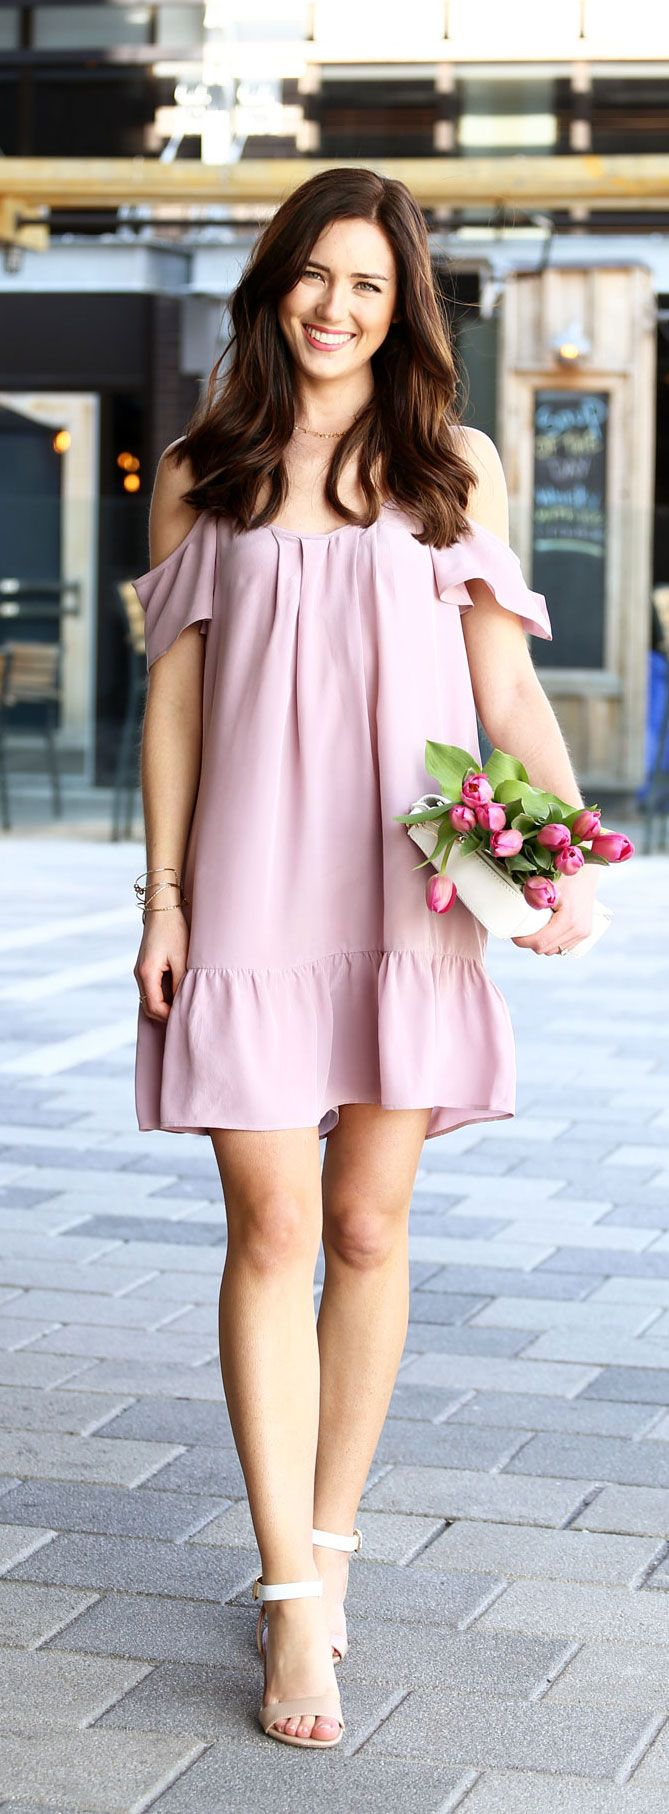 Cold-shoulder and drop-waist dress for Spring